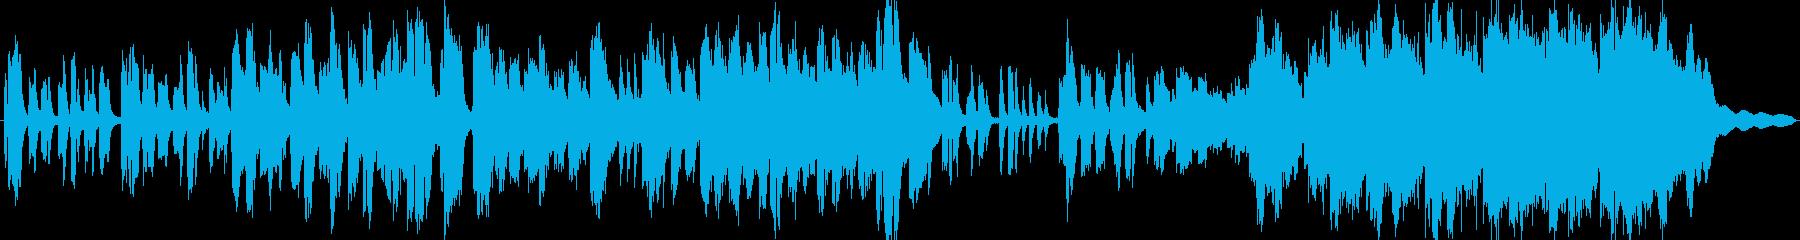 shab◎nの人気.ヒーリングソングの再生済みの波形